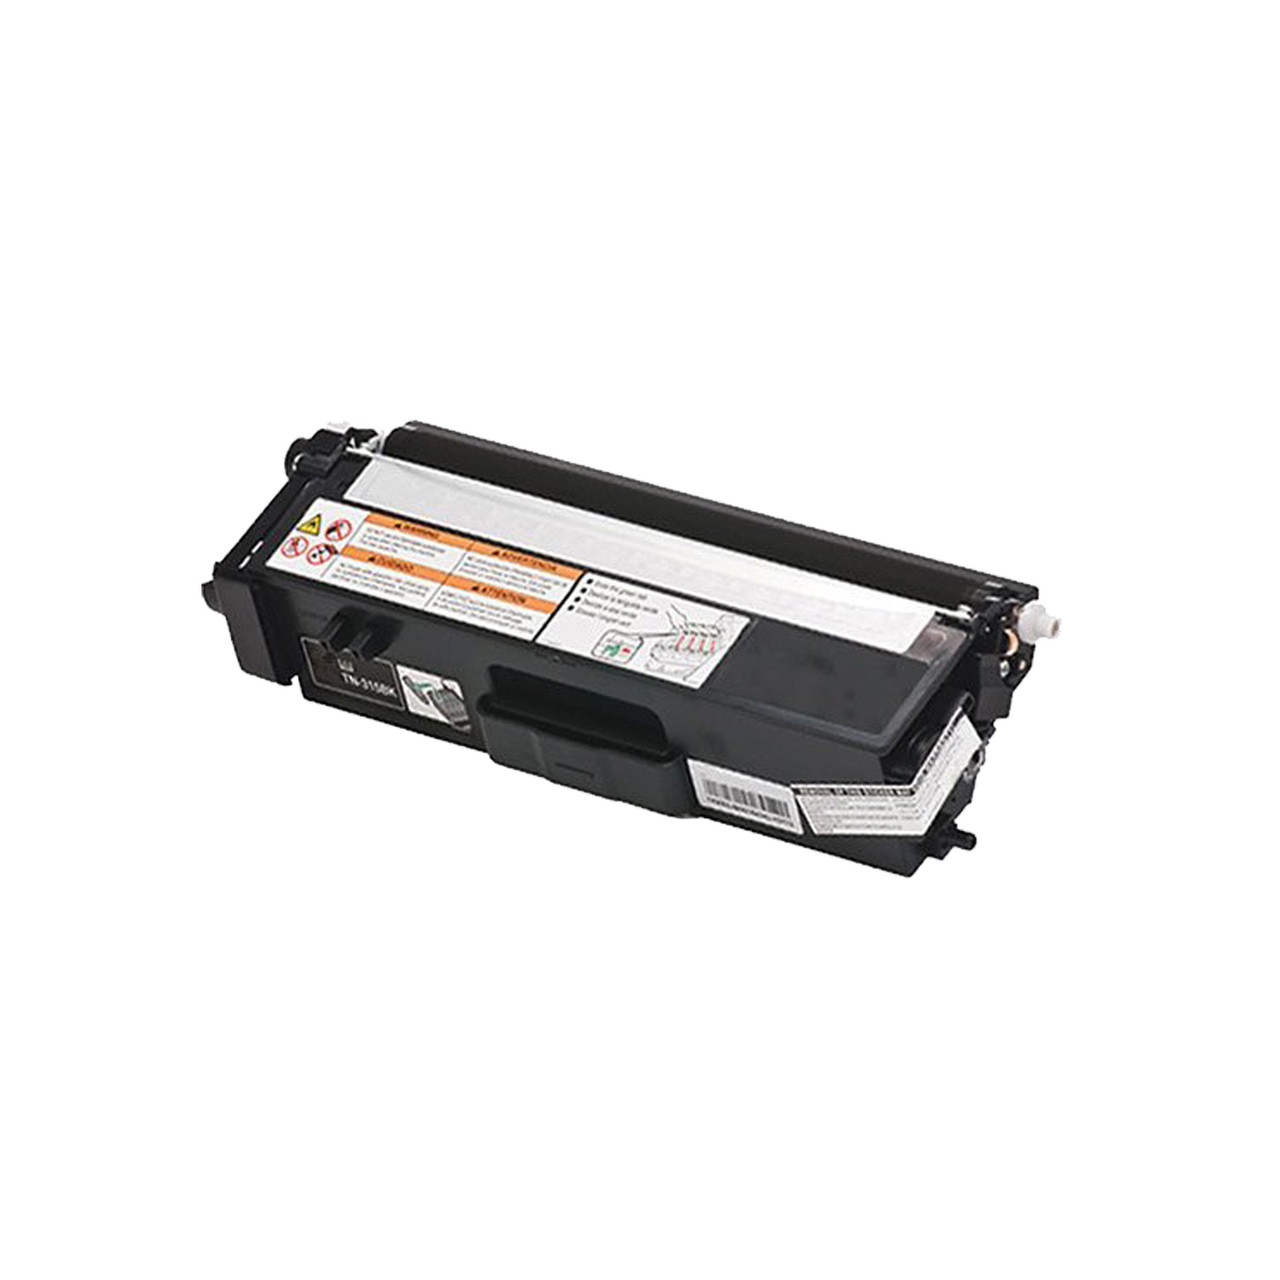 2 BLACK Toner Cartridge for  TN315BK MFC-9460cdn MFC-9560cdw MFC-9970cdw